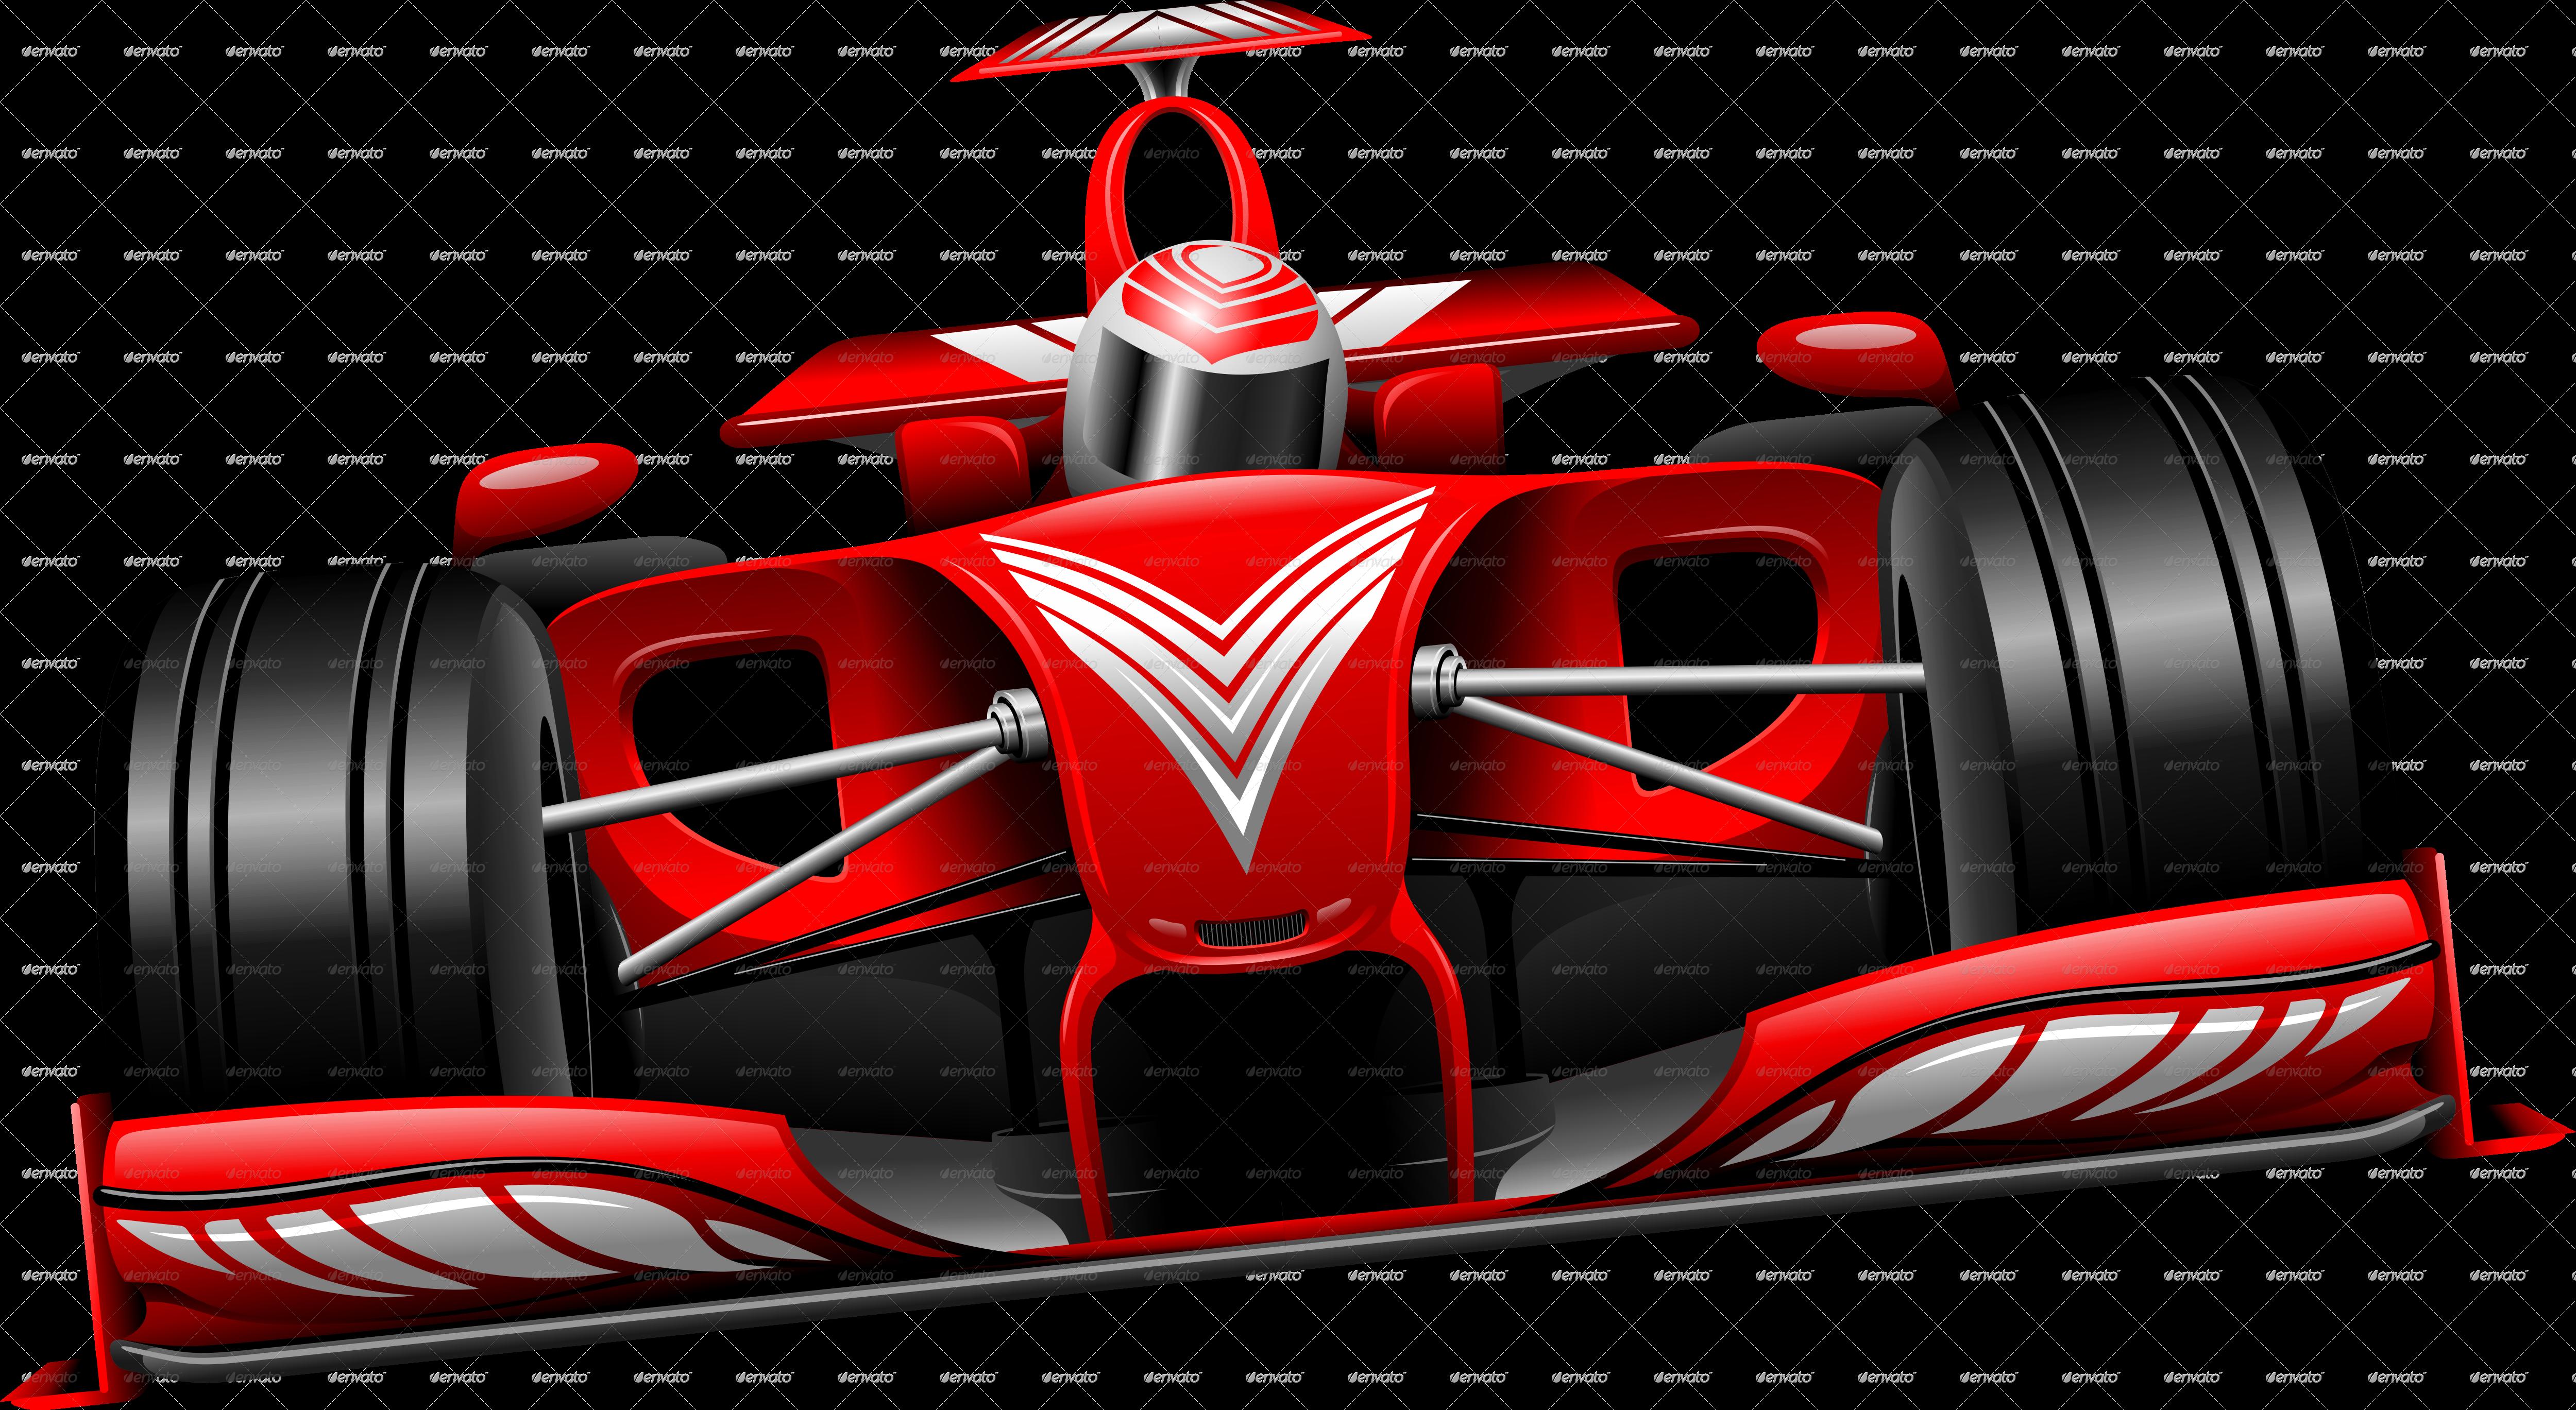 formula 1 red race car gp brazil by bluedarkat graphicriver checkered flag clip art jpeg checkered flag clip art border